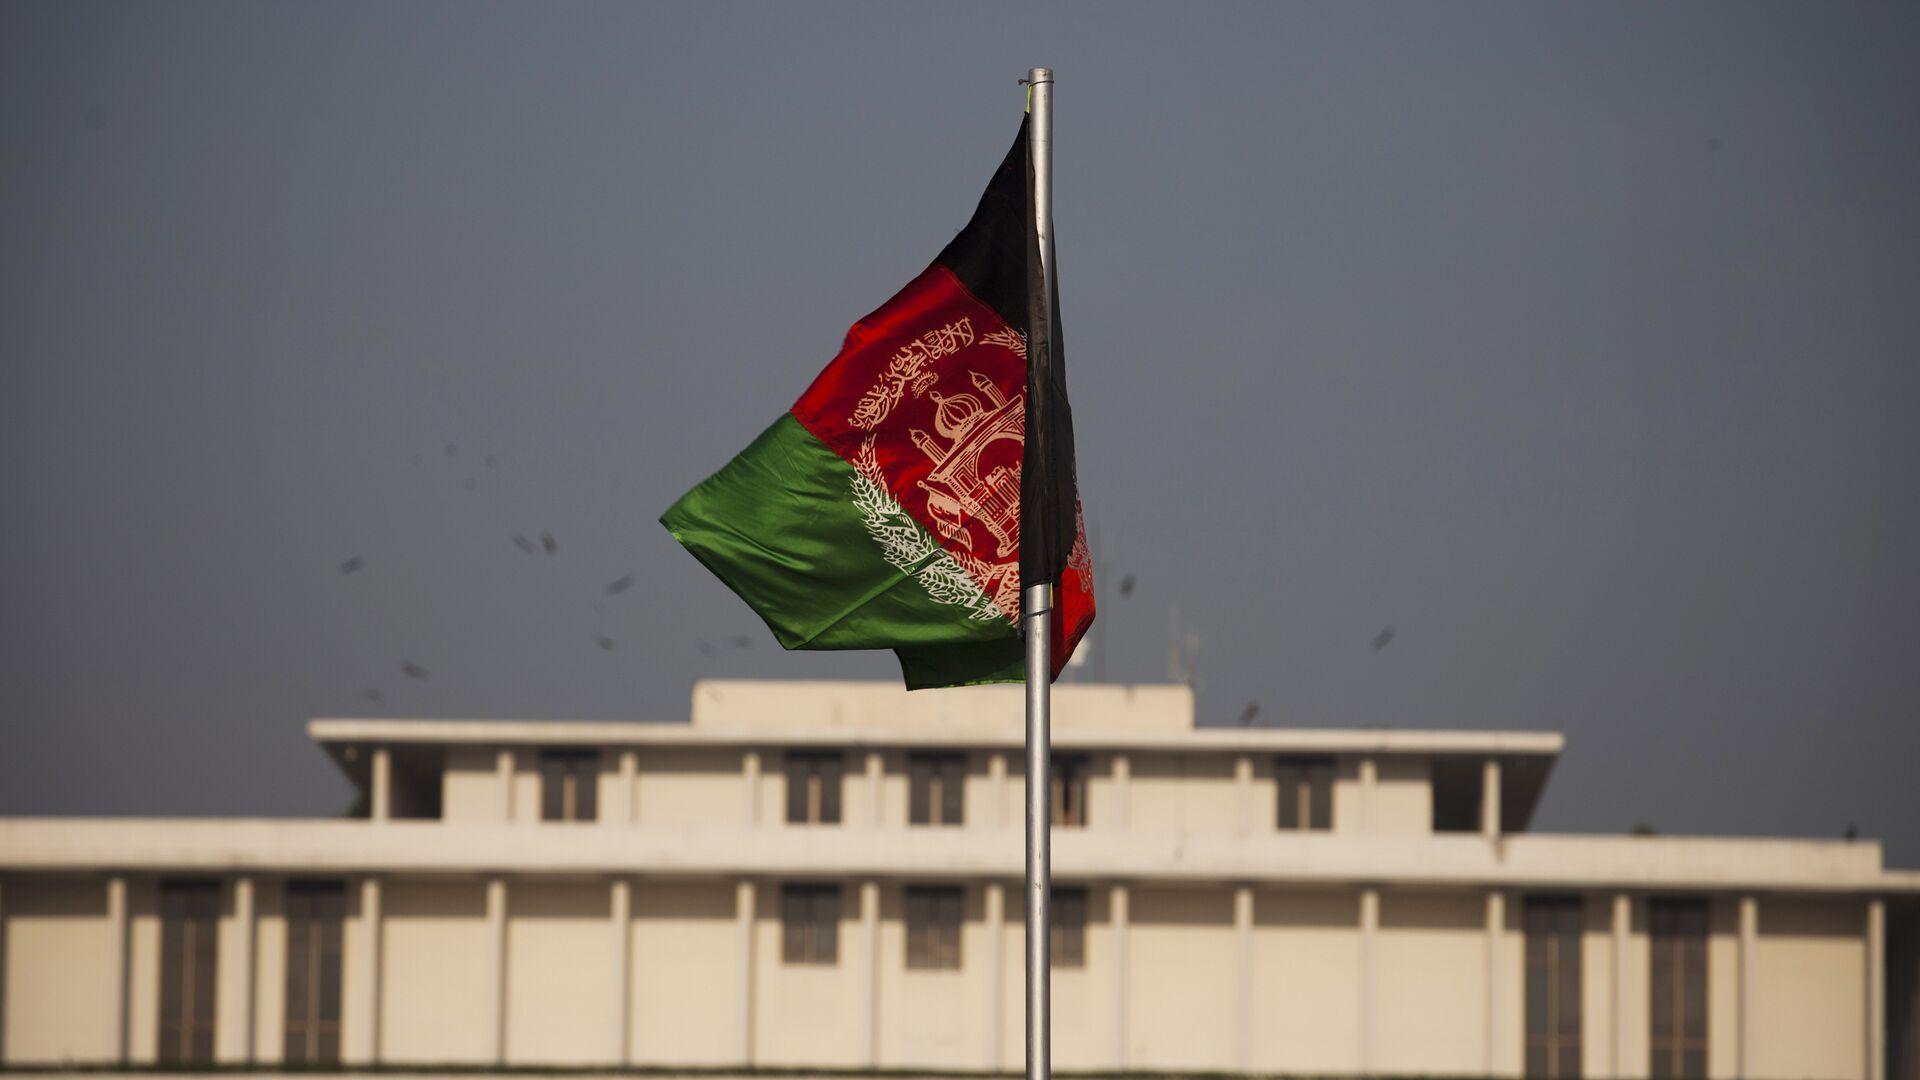 Bandera de Afganistán - Sputnik Mundo, 1920, 08.10.2021